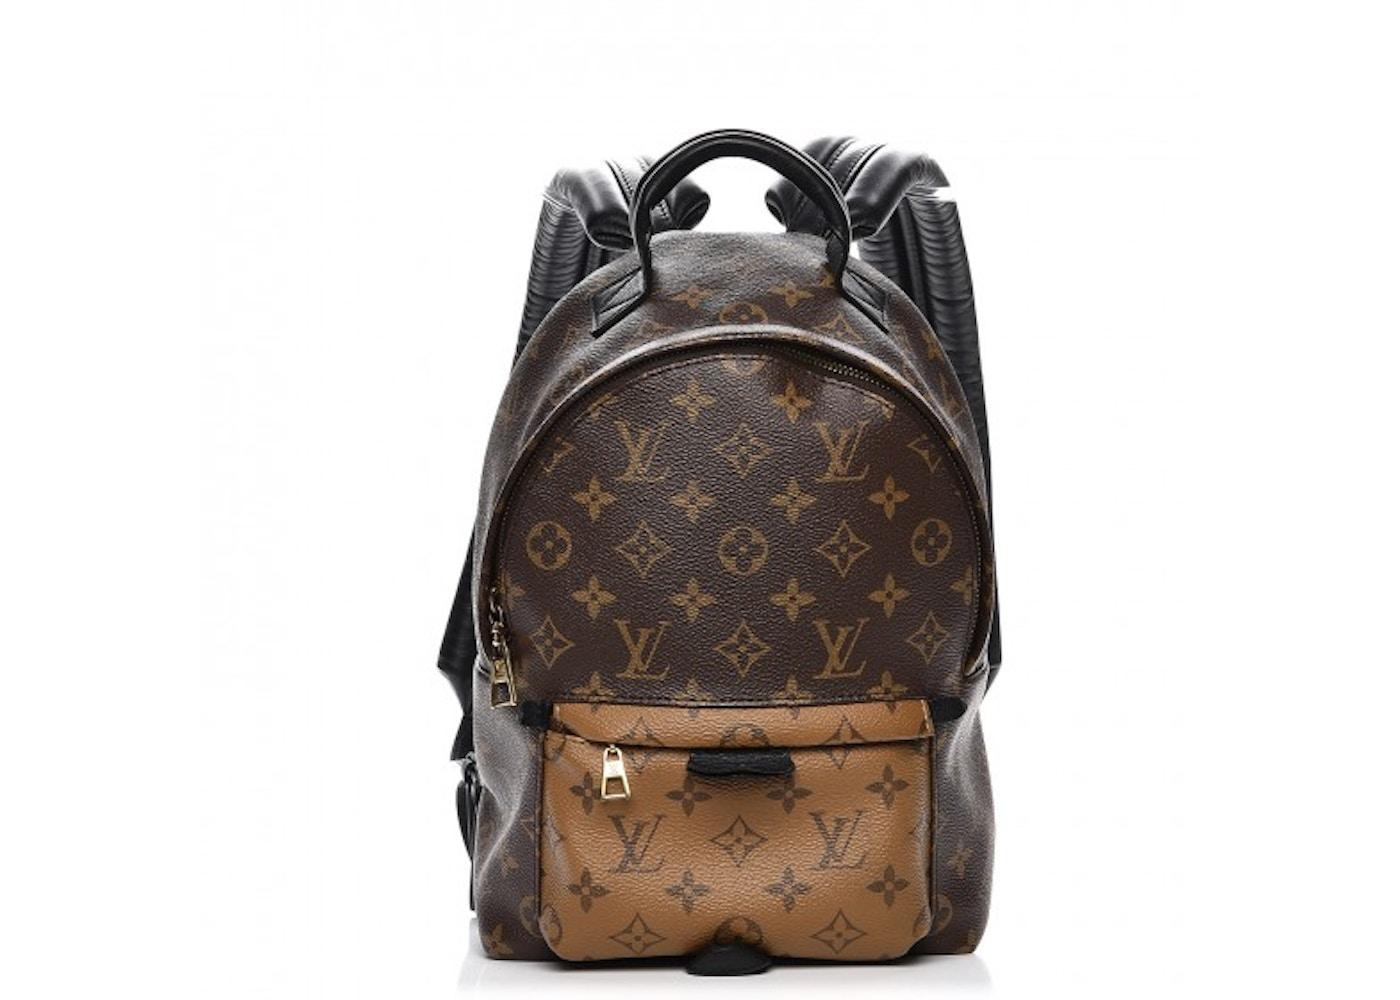 Louis Vuitton Backpack Palm Springs Monogram Reverse Pm Brown